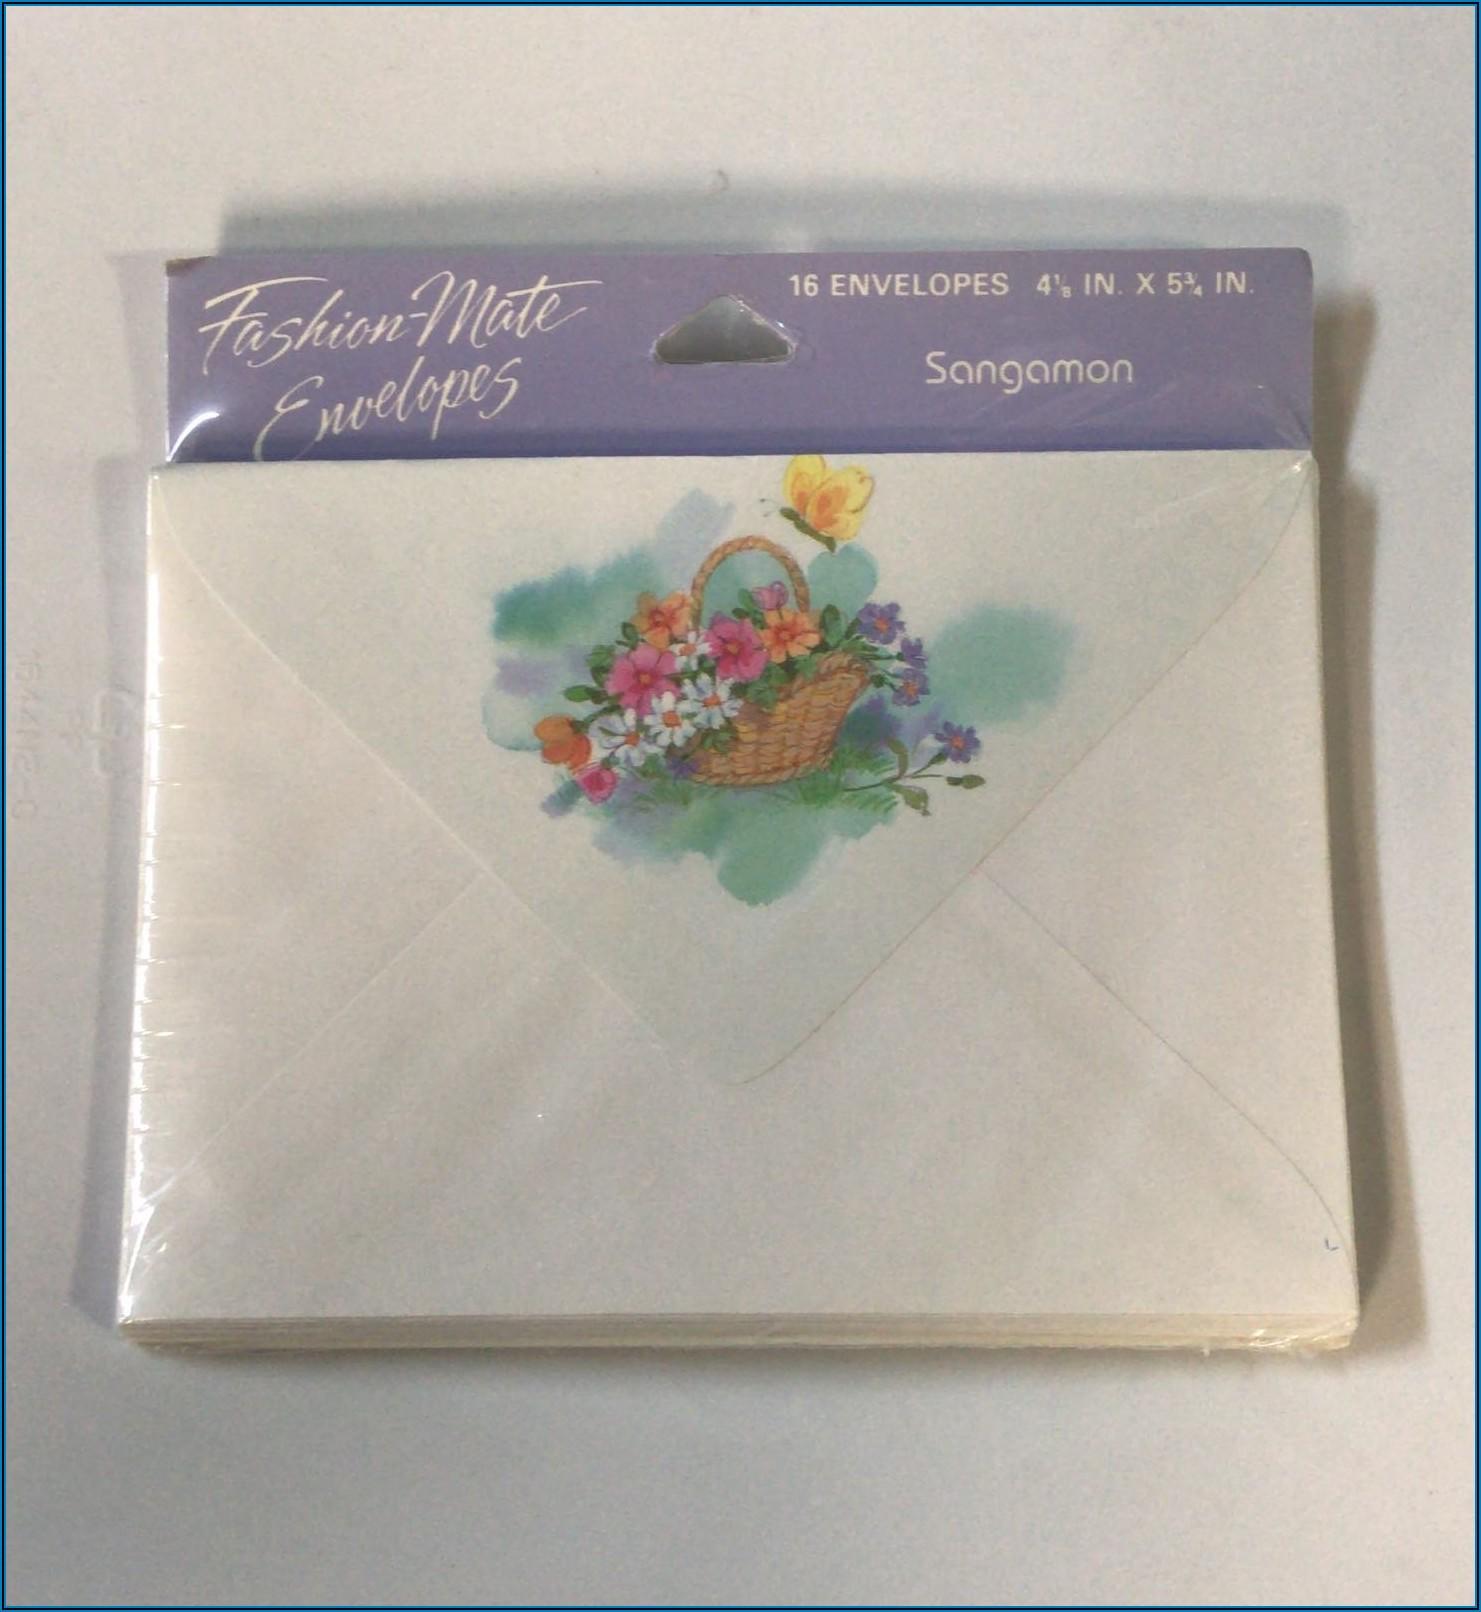 4 X 5 Envelopes Walmart